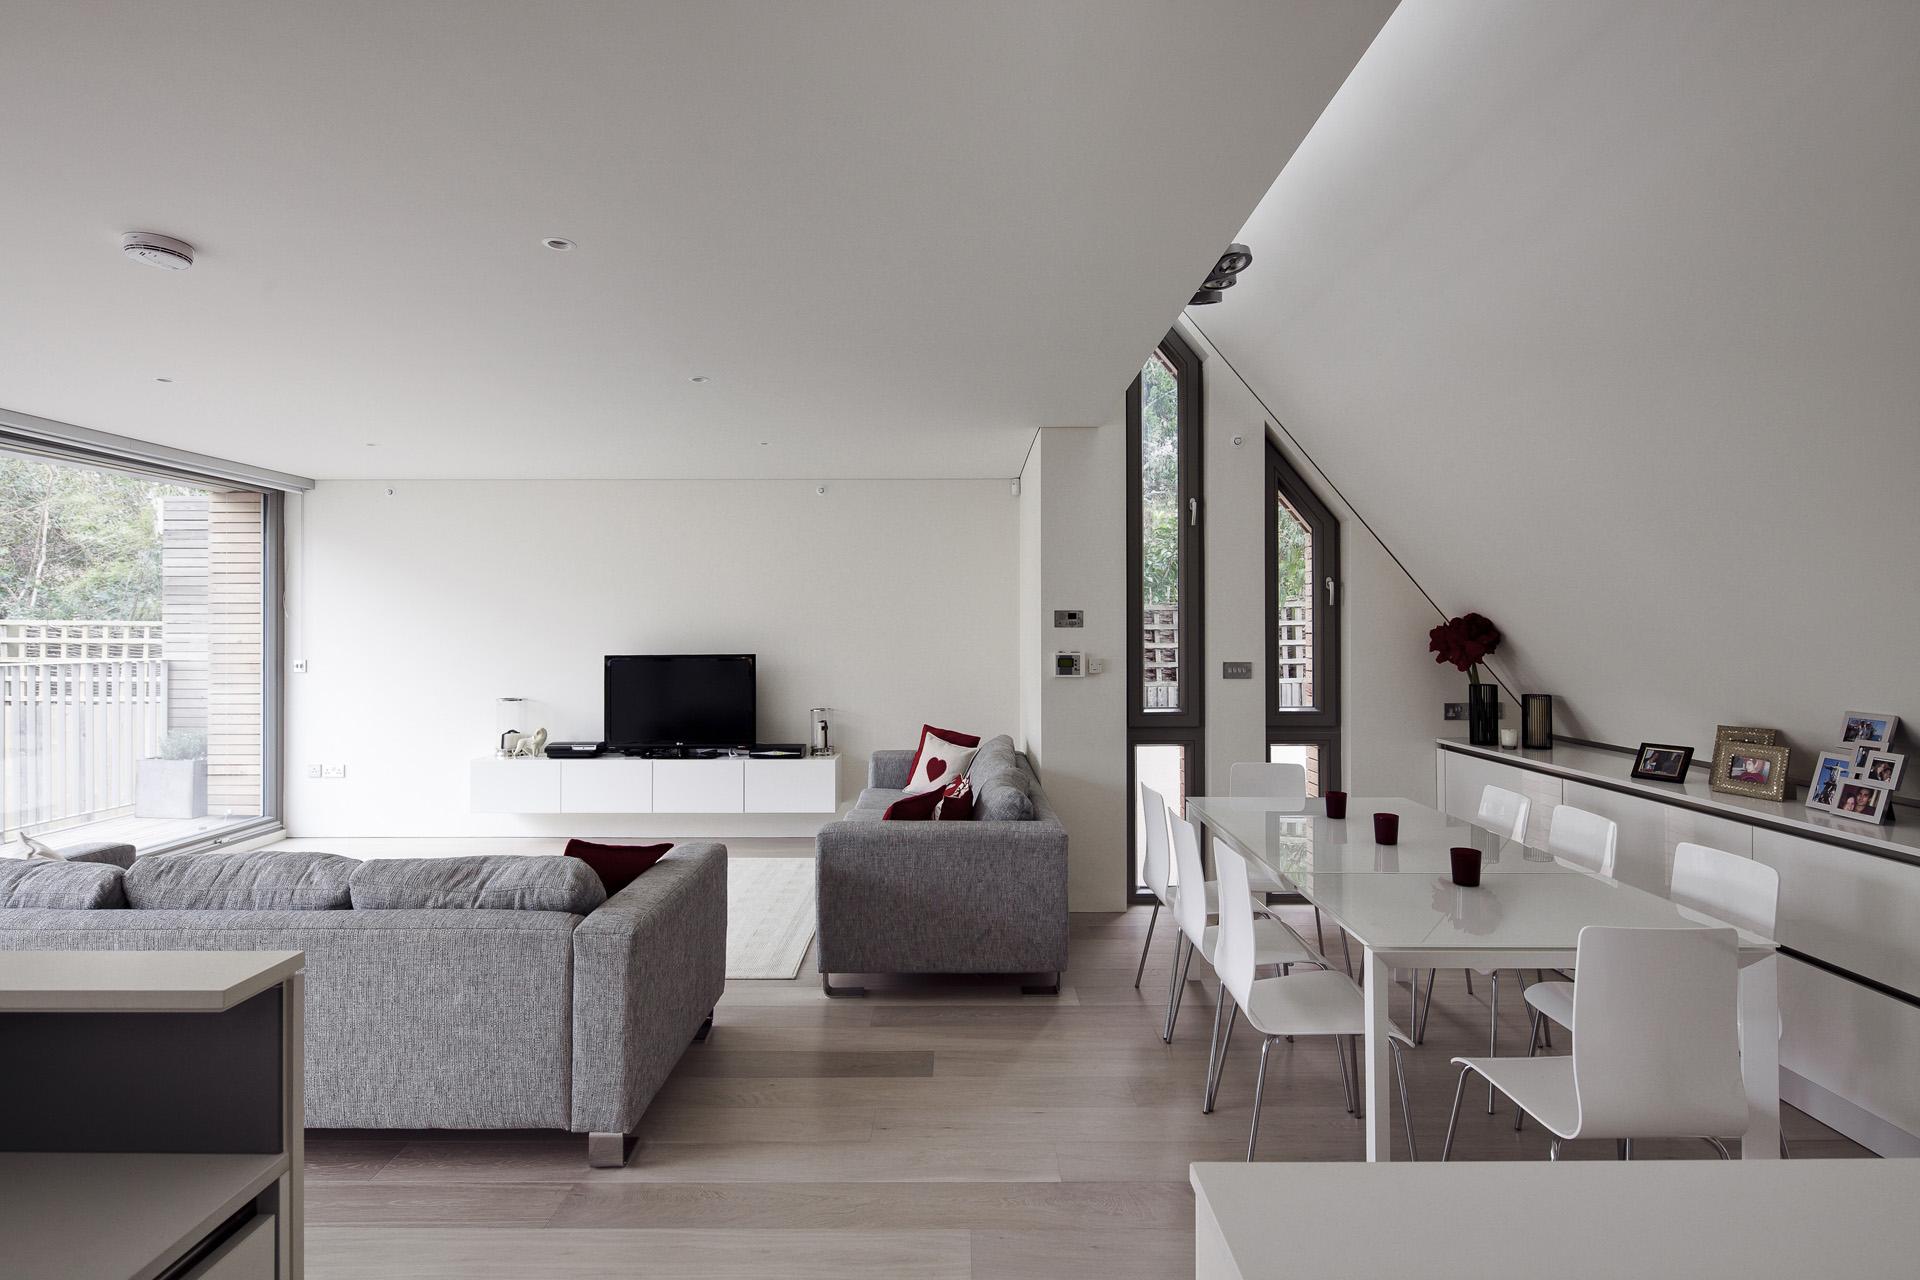 camden-passive-house-interior-02